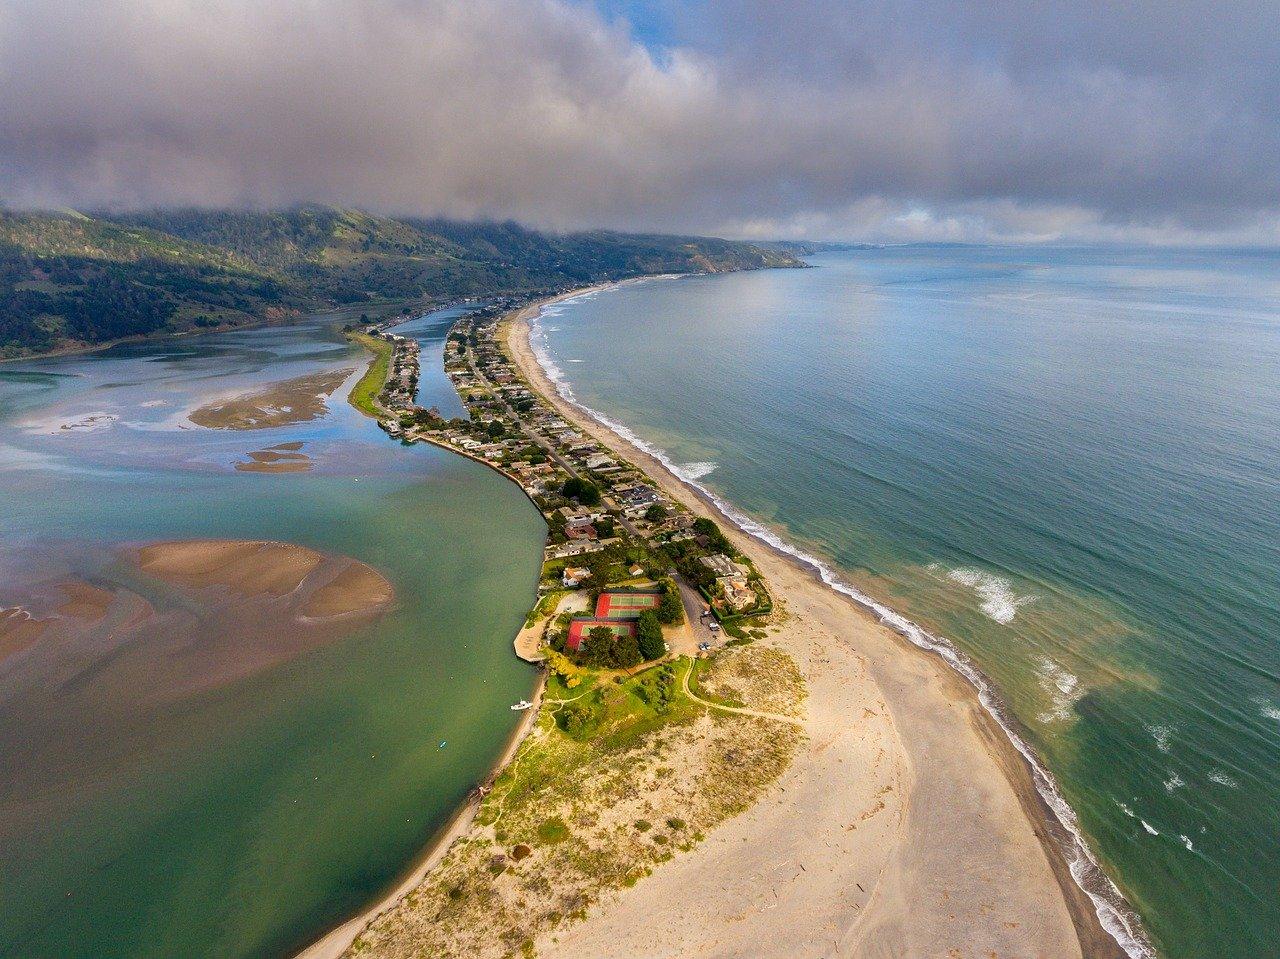 Attraction Beach Spot in California-Stinson Beach, Marin County